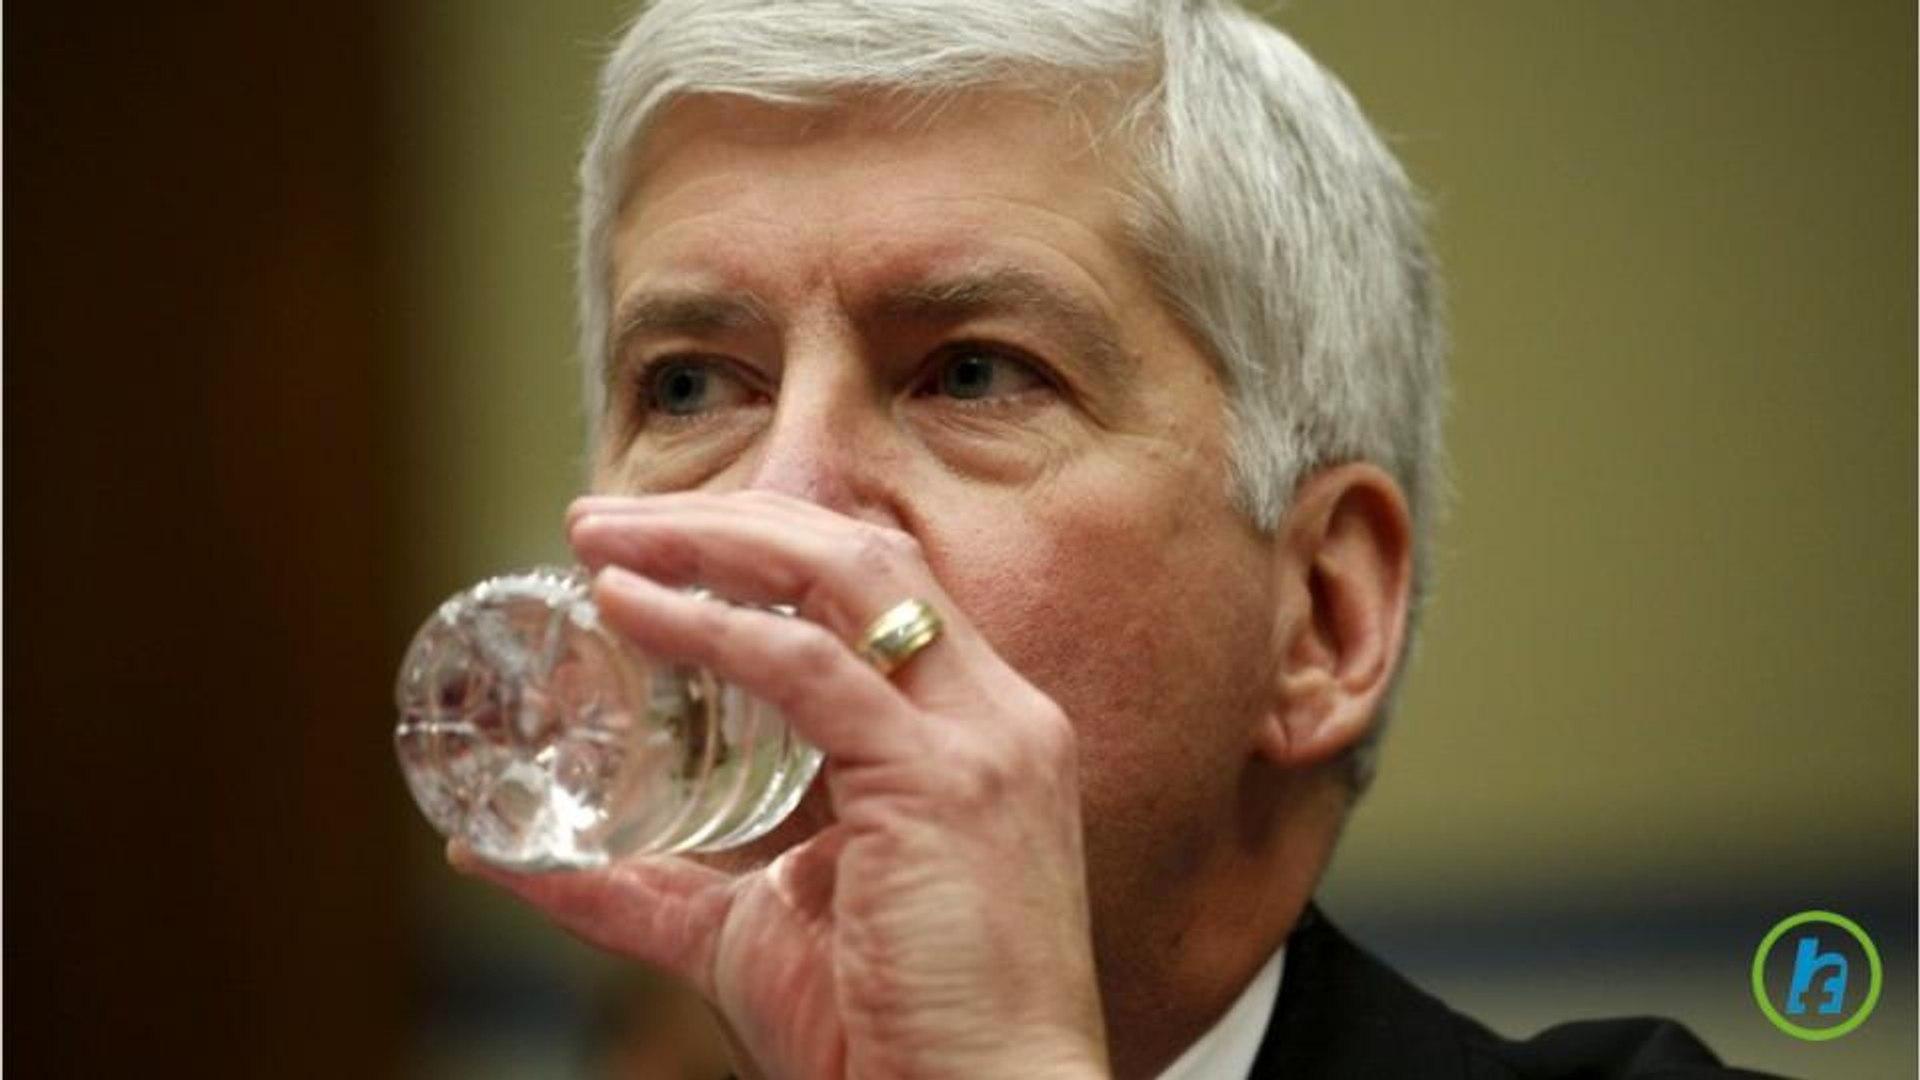 Lead Poisoning & Respiratory illness, Legionnaires' disease, Diagnosed in Flint, Michigan